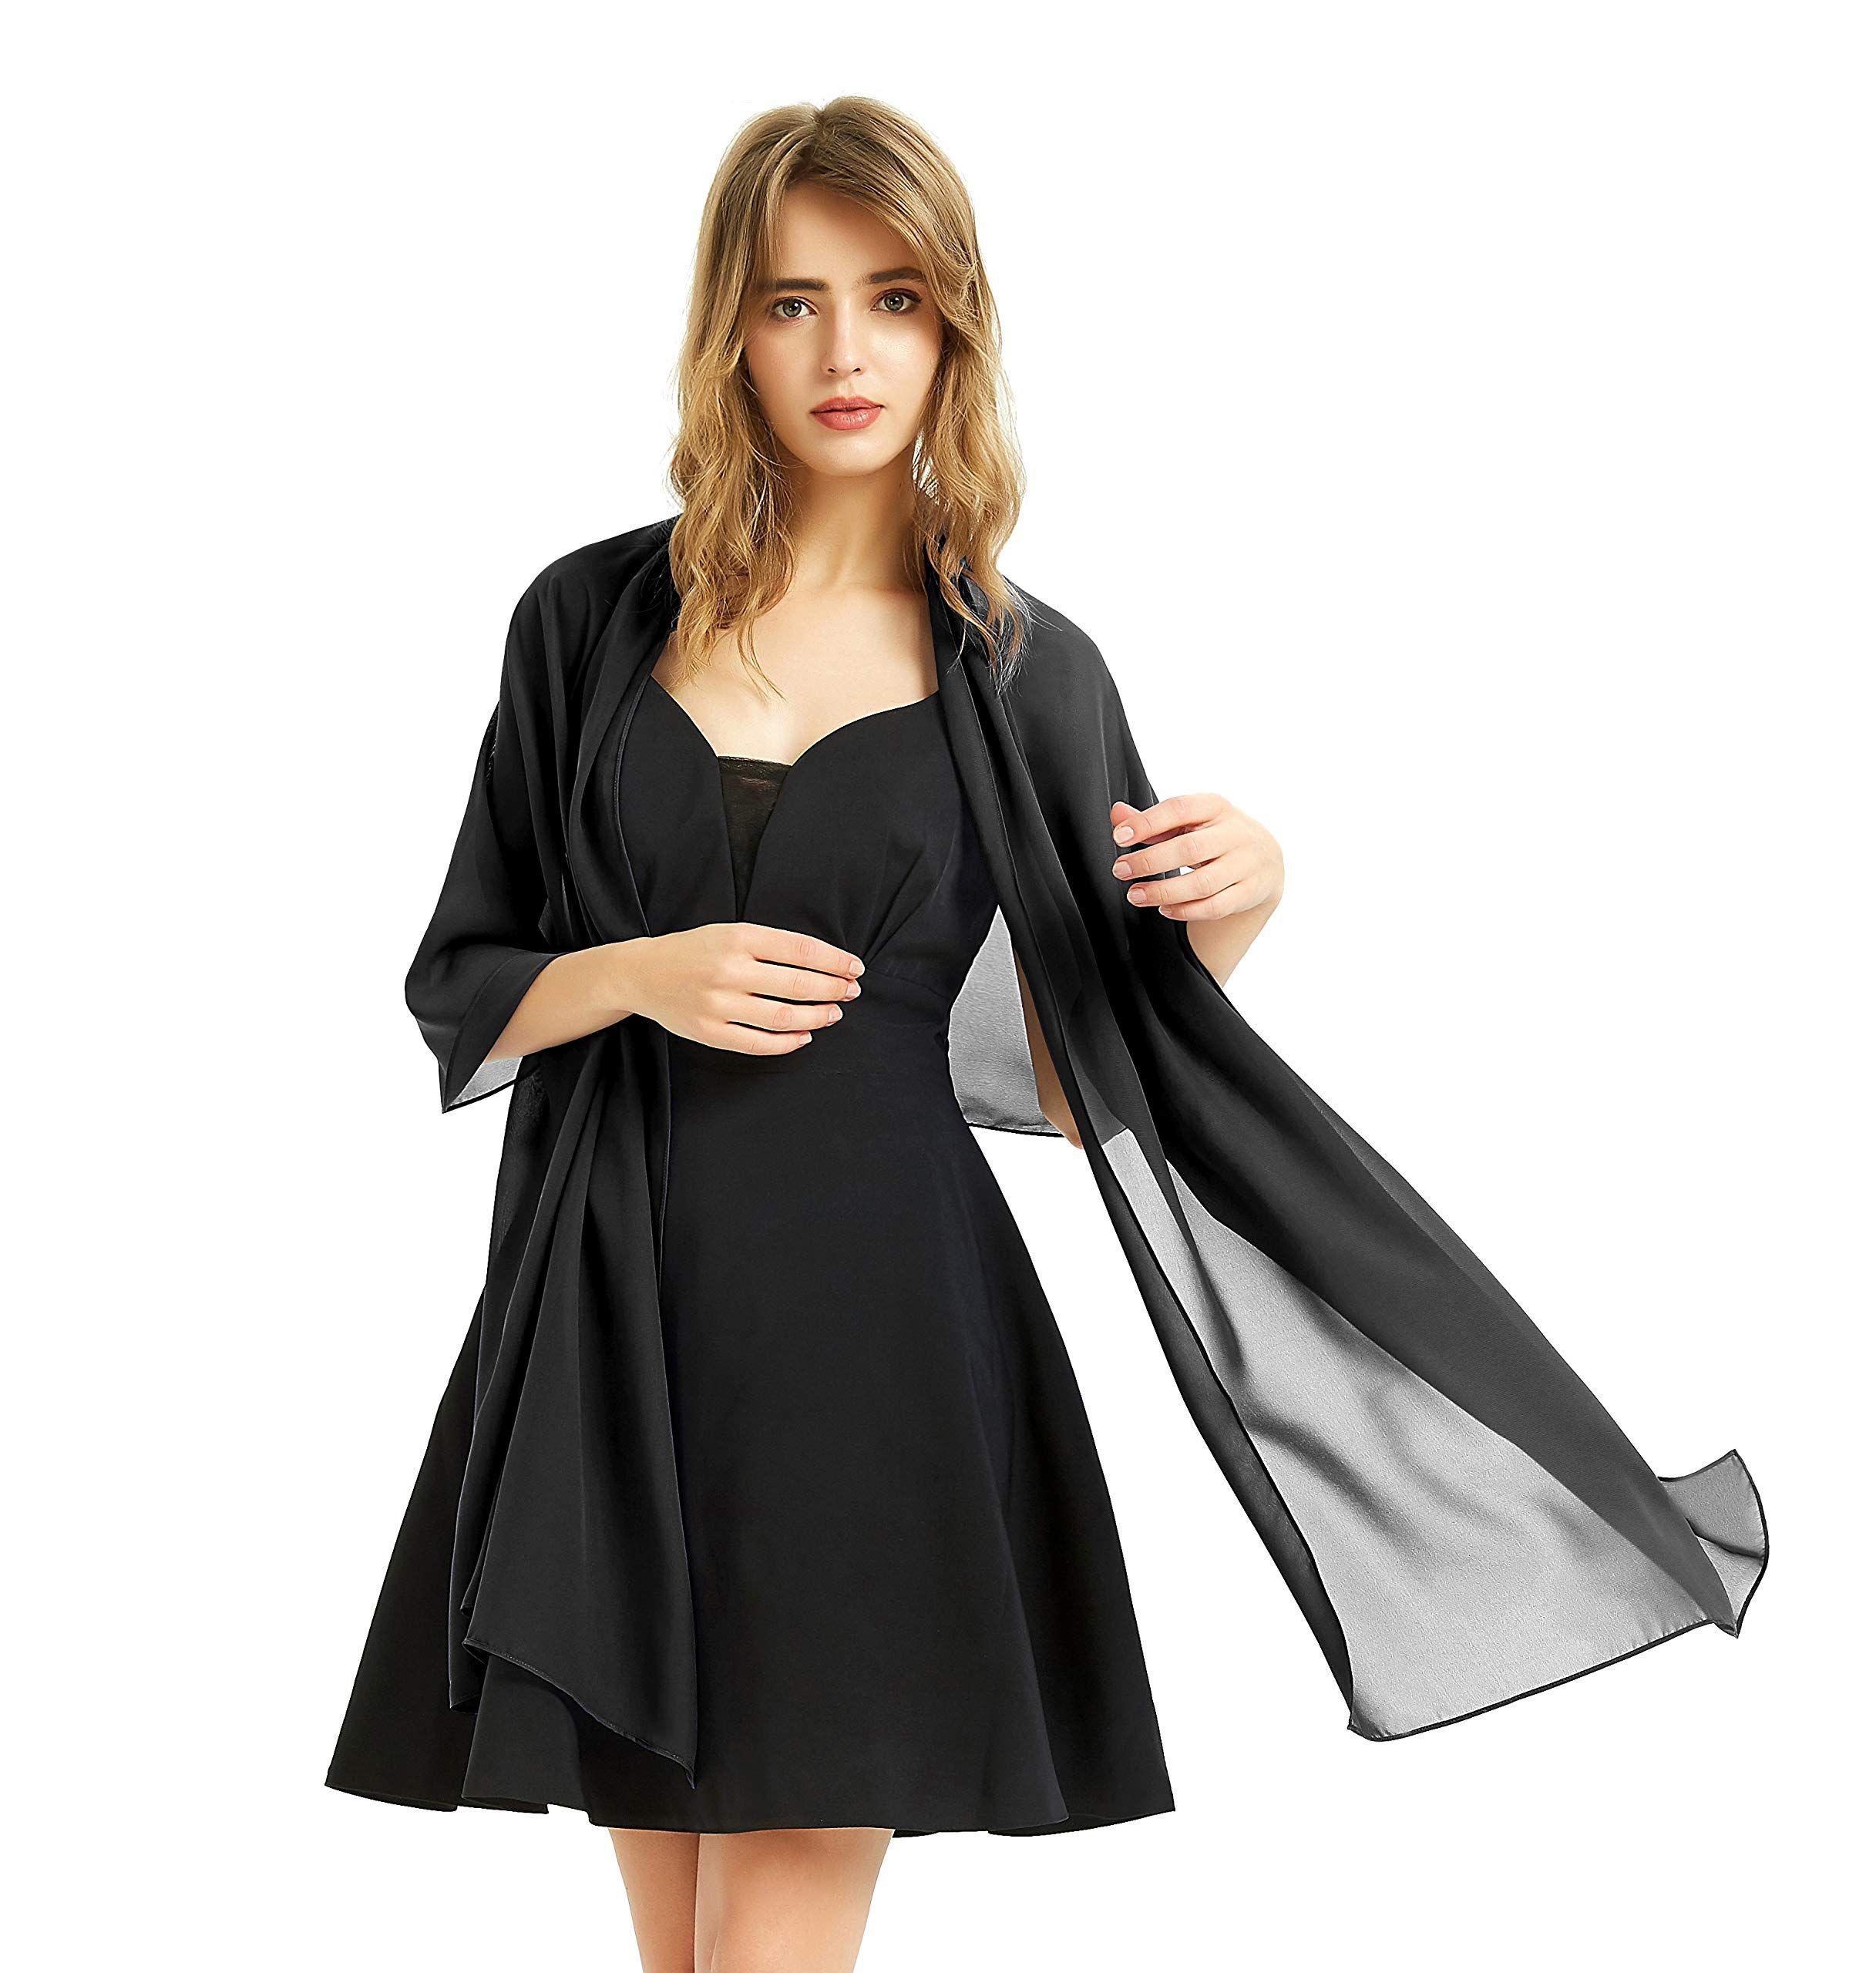 Elegant Soft Chiffon Bridal Womens Scarf Shawls Wraps For Dresses Women Accessories Buy Scarves And Wraps Buy Scarf Womens Dresses Women S Evening Dresses